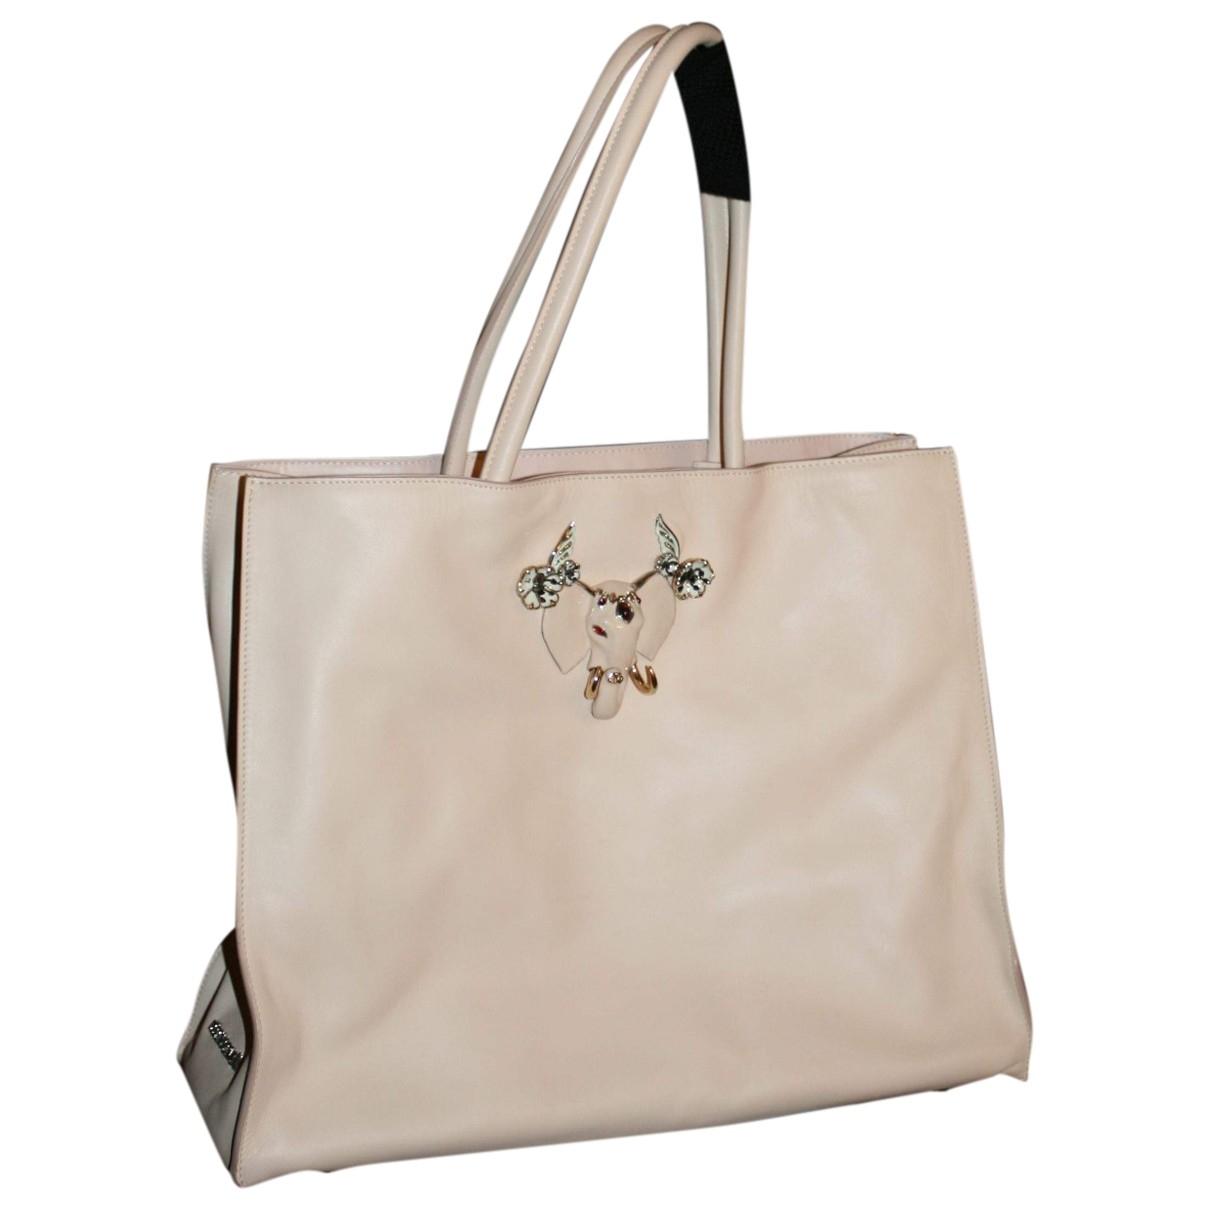 Roberto Cavalli \N Pink Leather handbag for Women \N